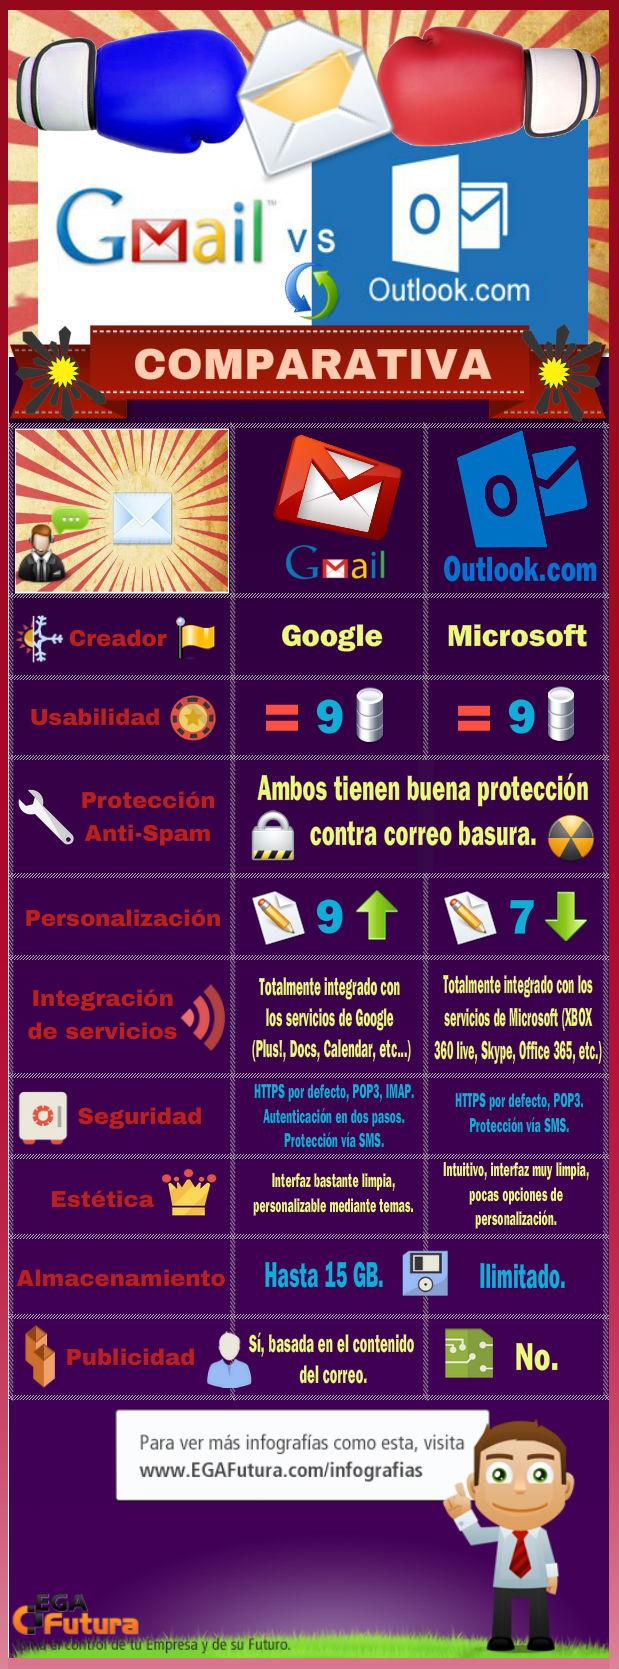 Gmail vs Outlook